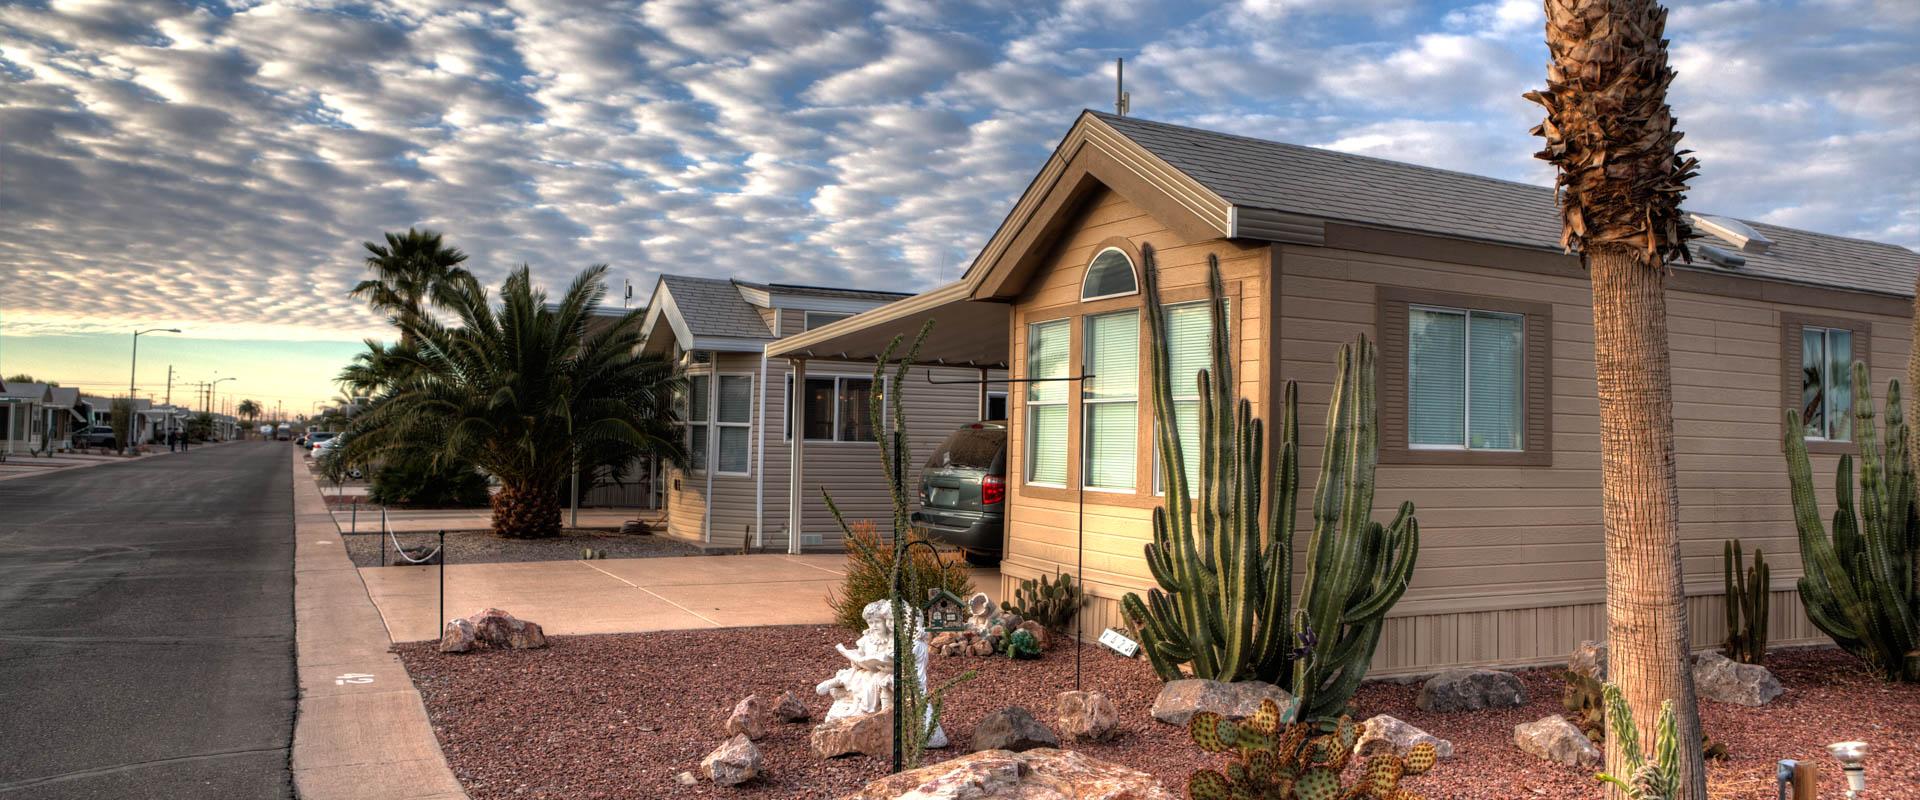 Arizona Park Model Homes for Sale Casa Grande